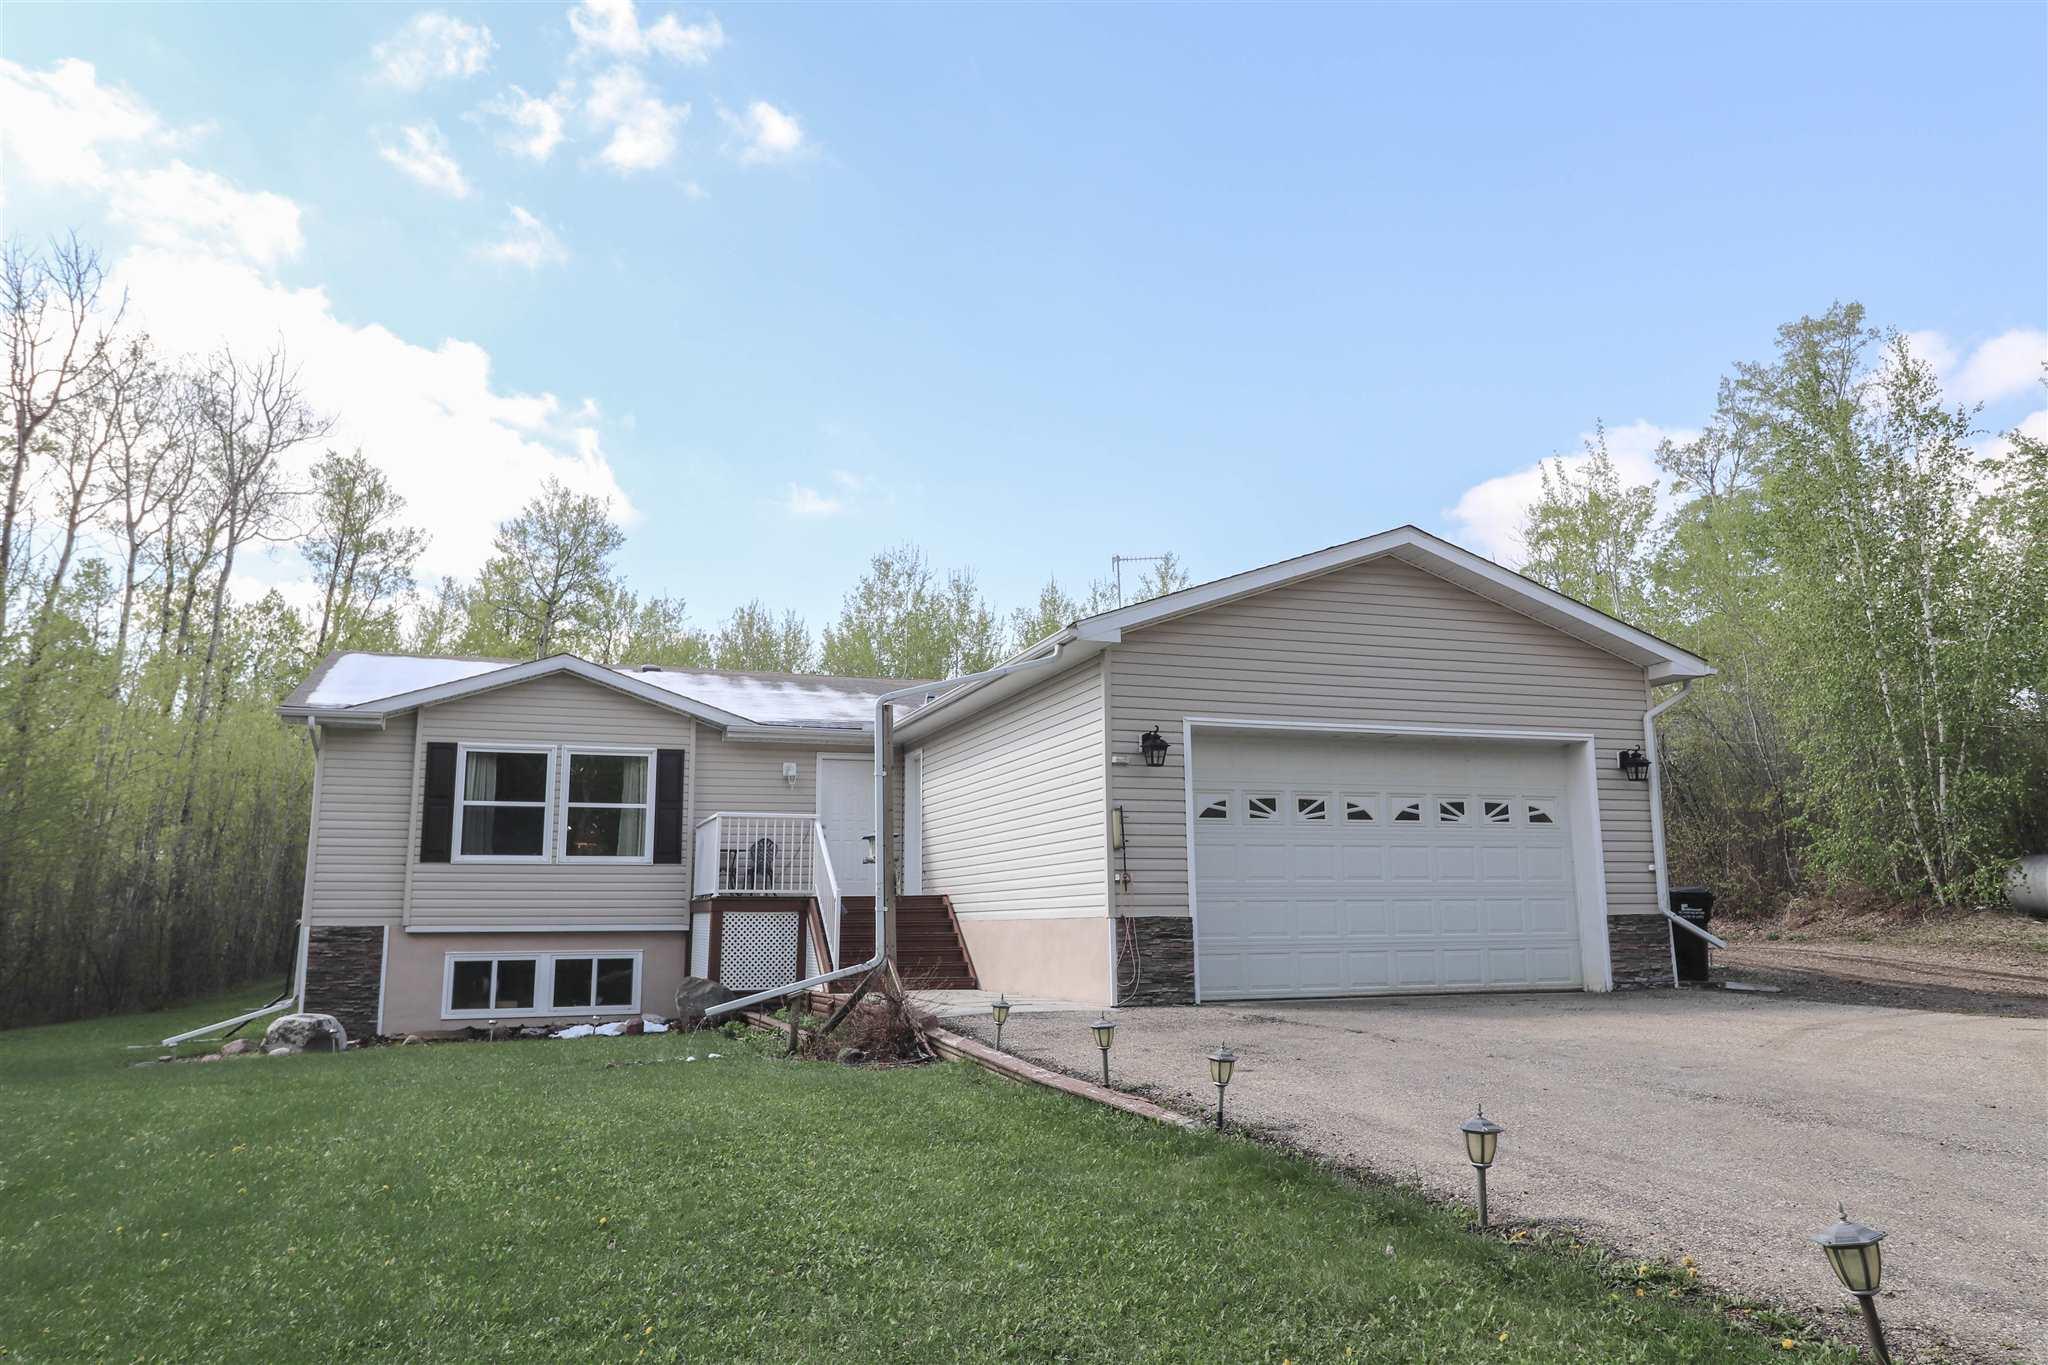 Hude Estates Detached Single Family for sale:  2 bedroom 1,407.50 sq.ft. (Listed 2021-05-21)